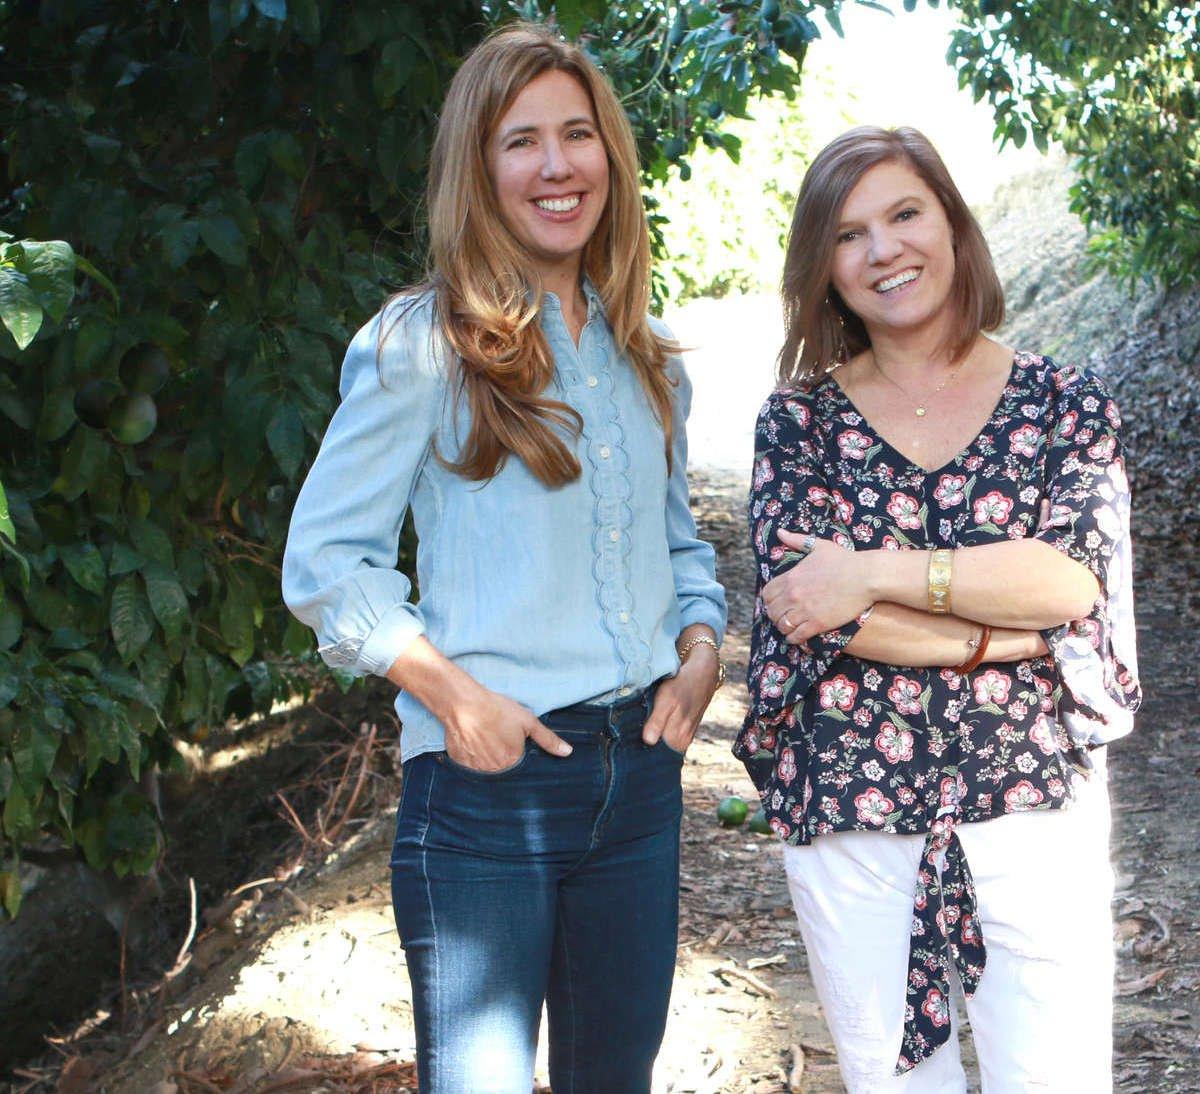 AVOILA Founders Kristy Hunston Grace OSullivan standing on path in avocado farm.